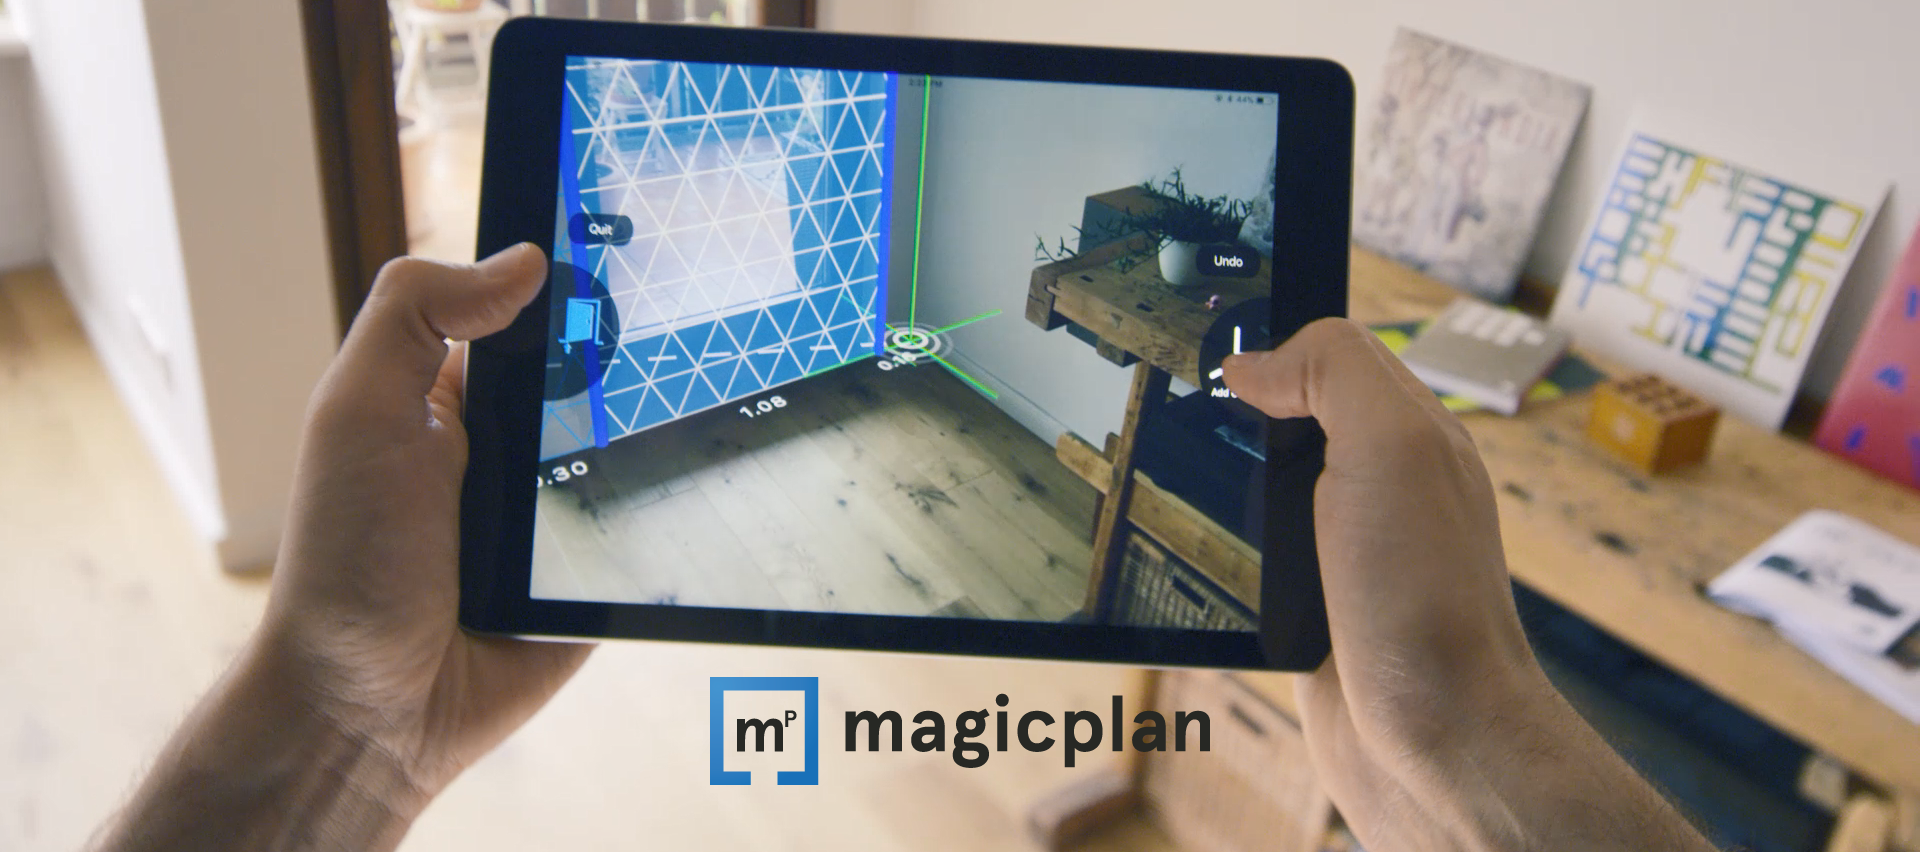 Magicplan Floor Plan Creation App